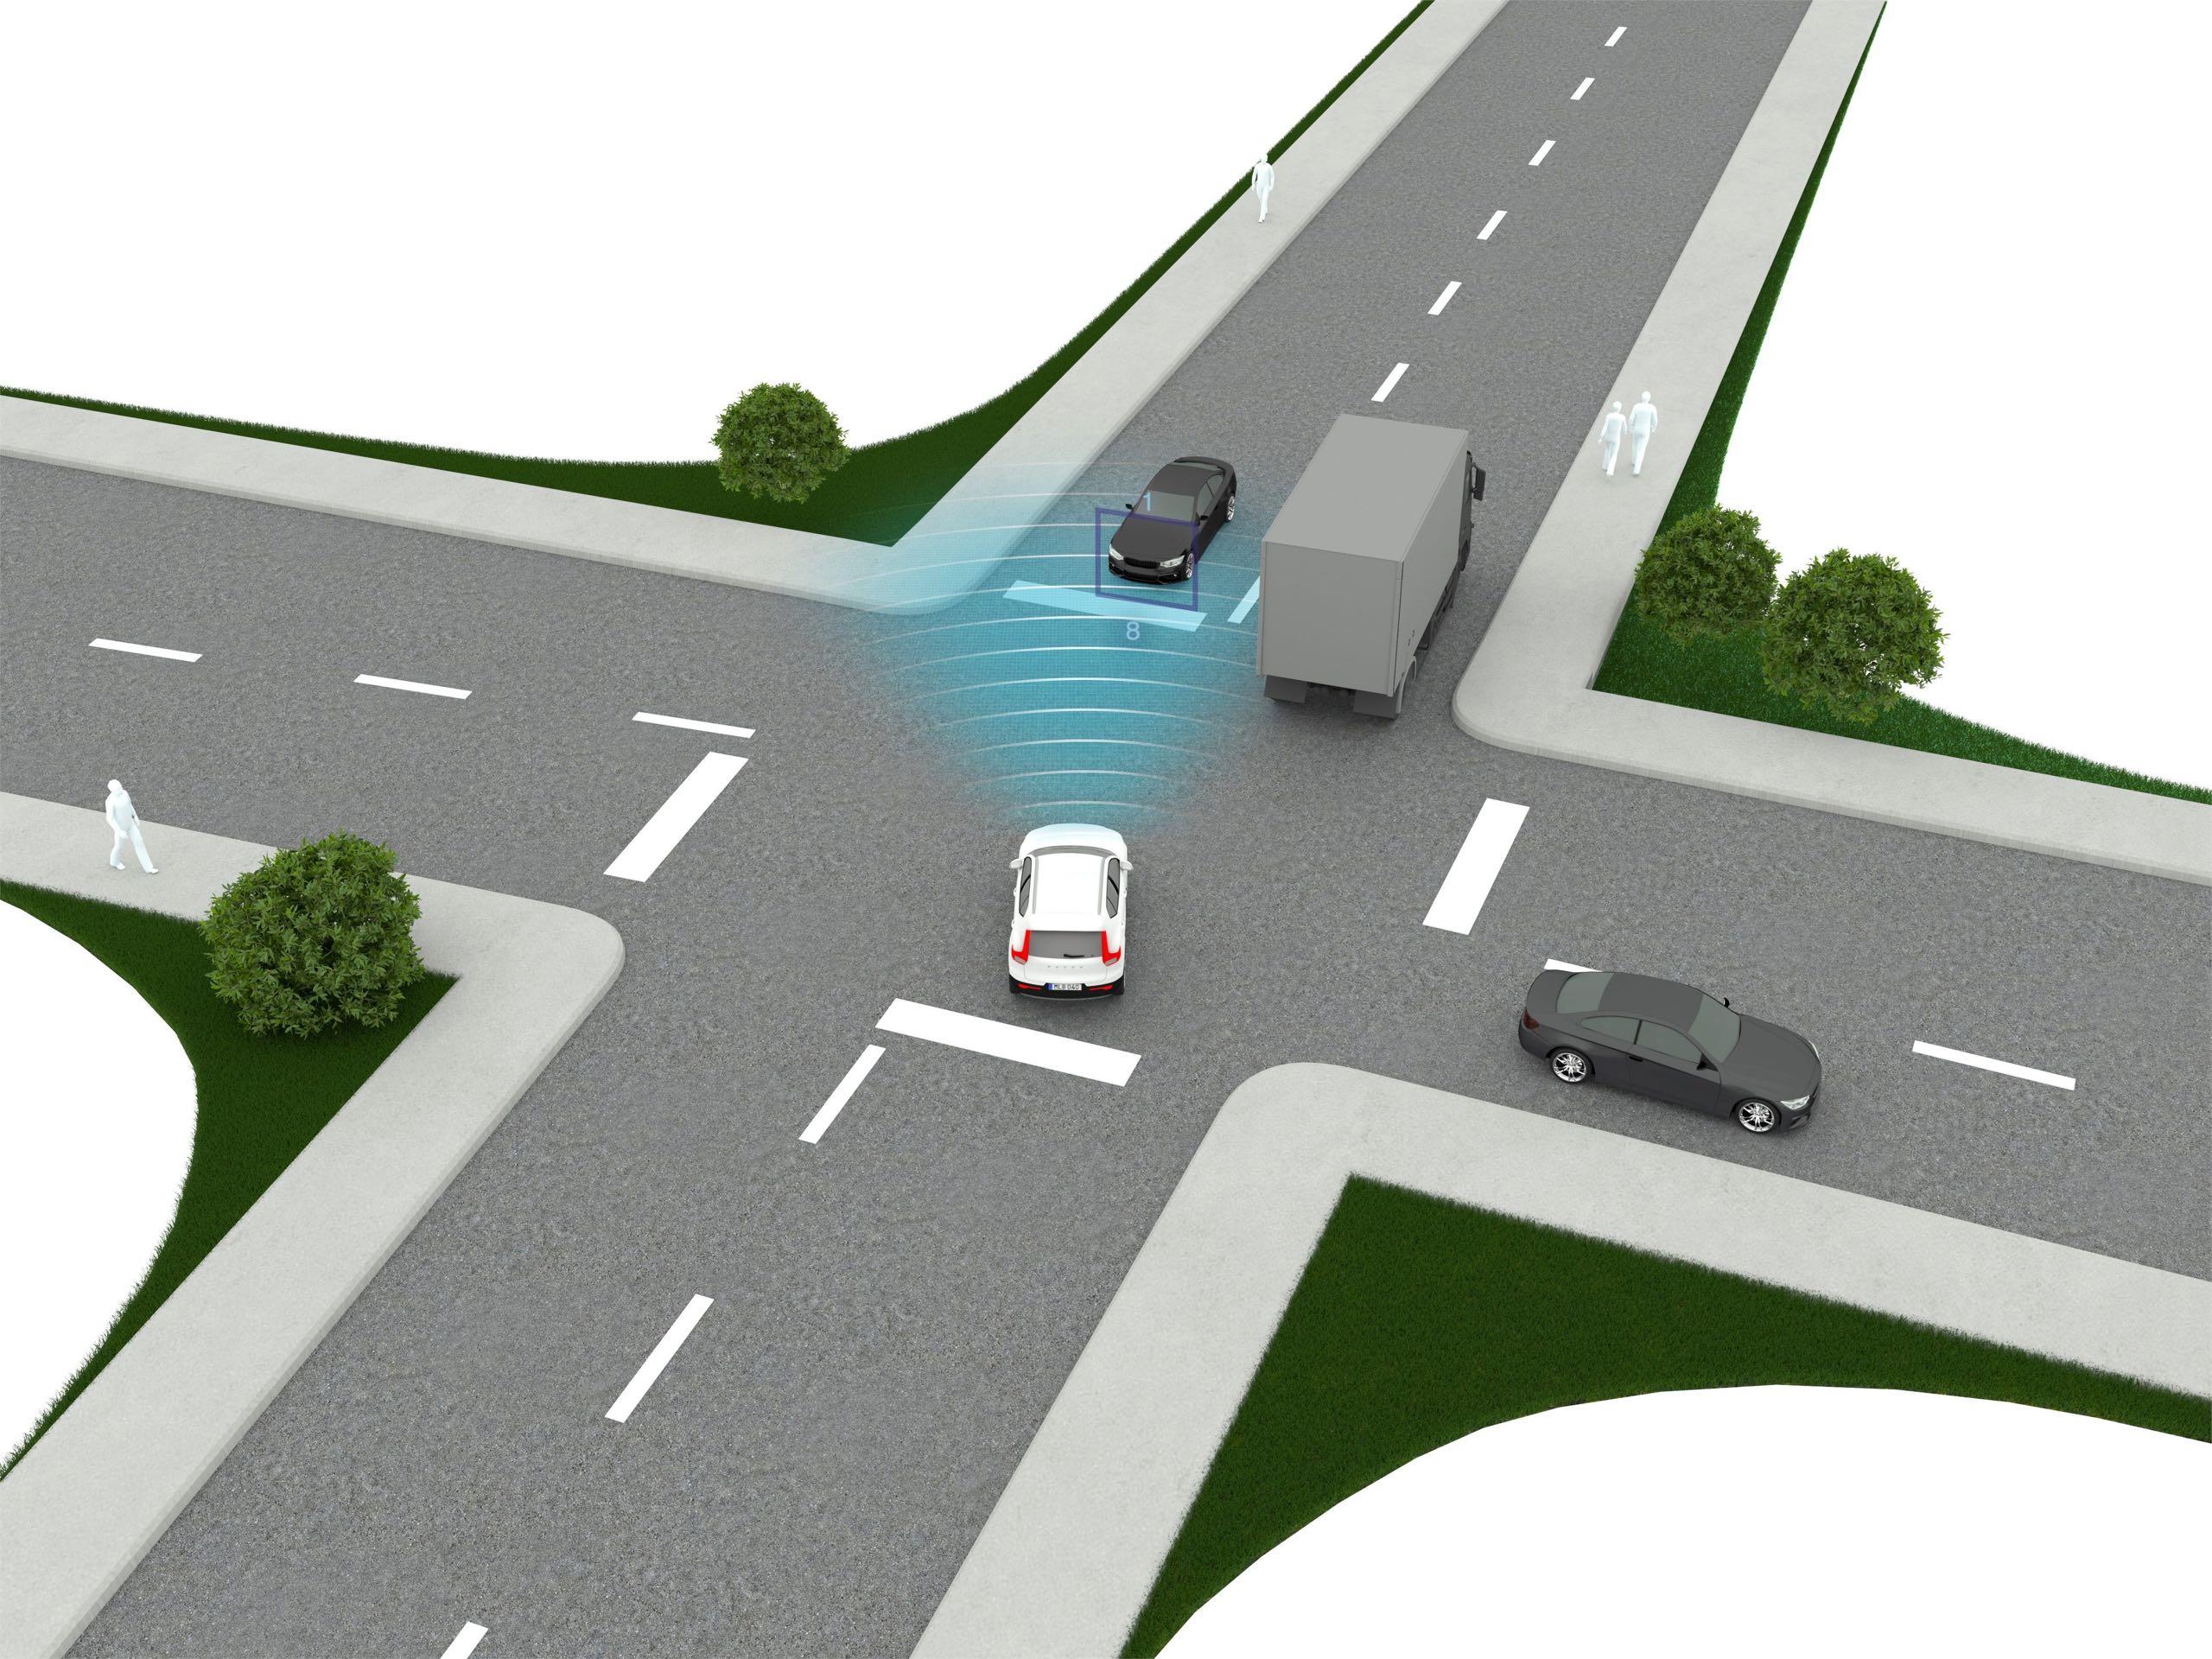 New Volvo XC40 City Safety Intersection -  2017, 2018, 2018 New XC40, Illustration, New XC40, Safety, Technology